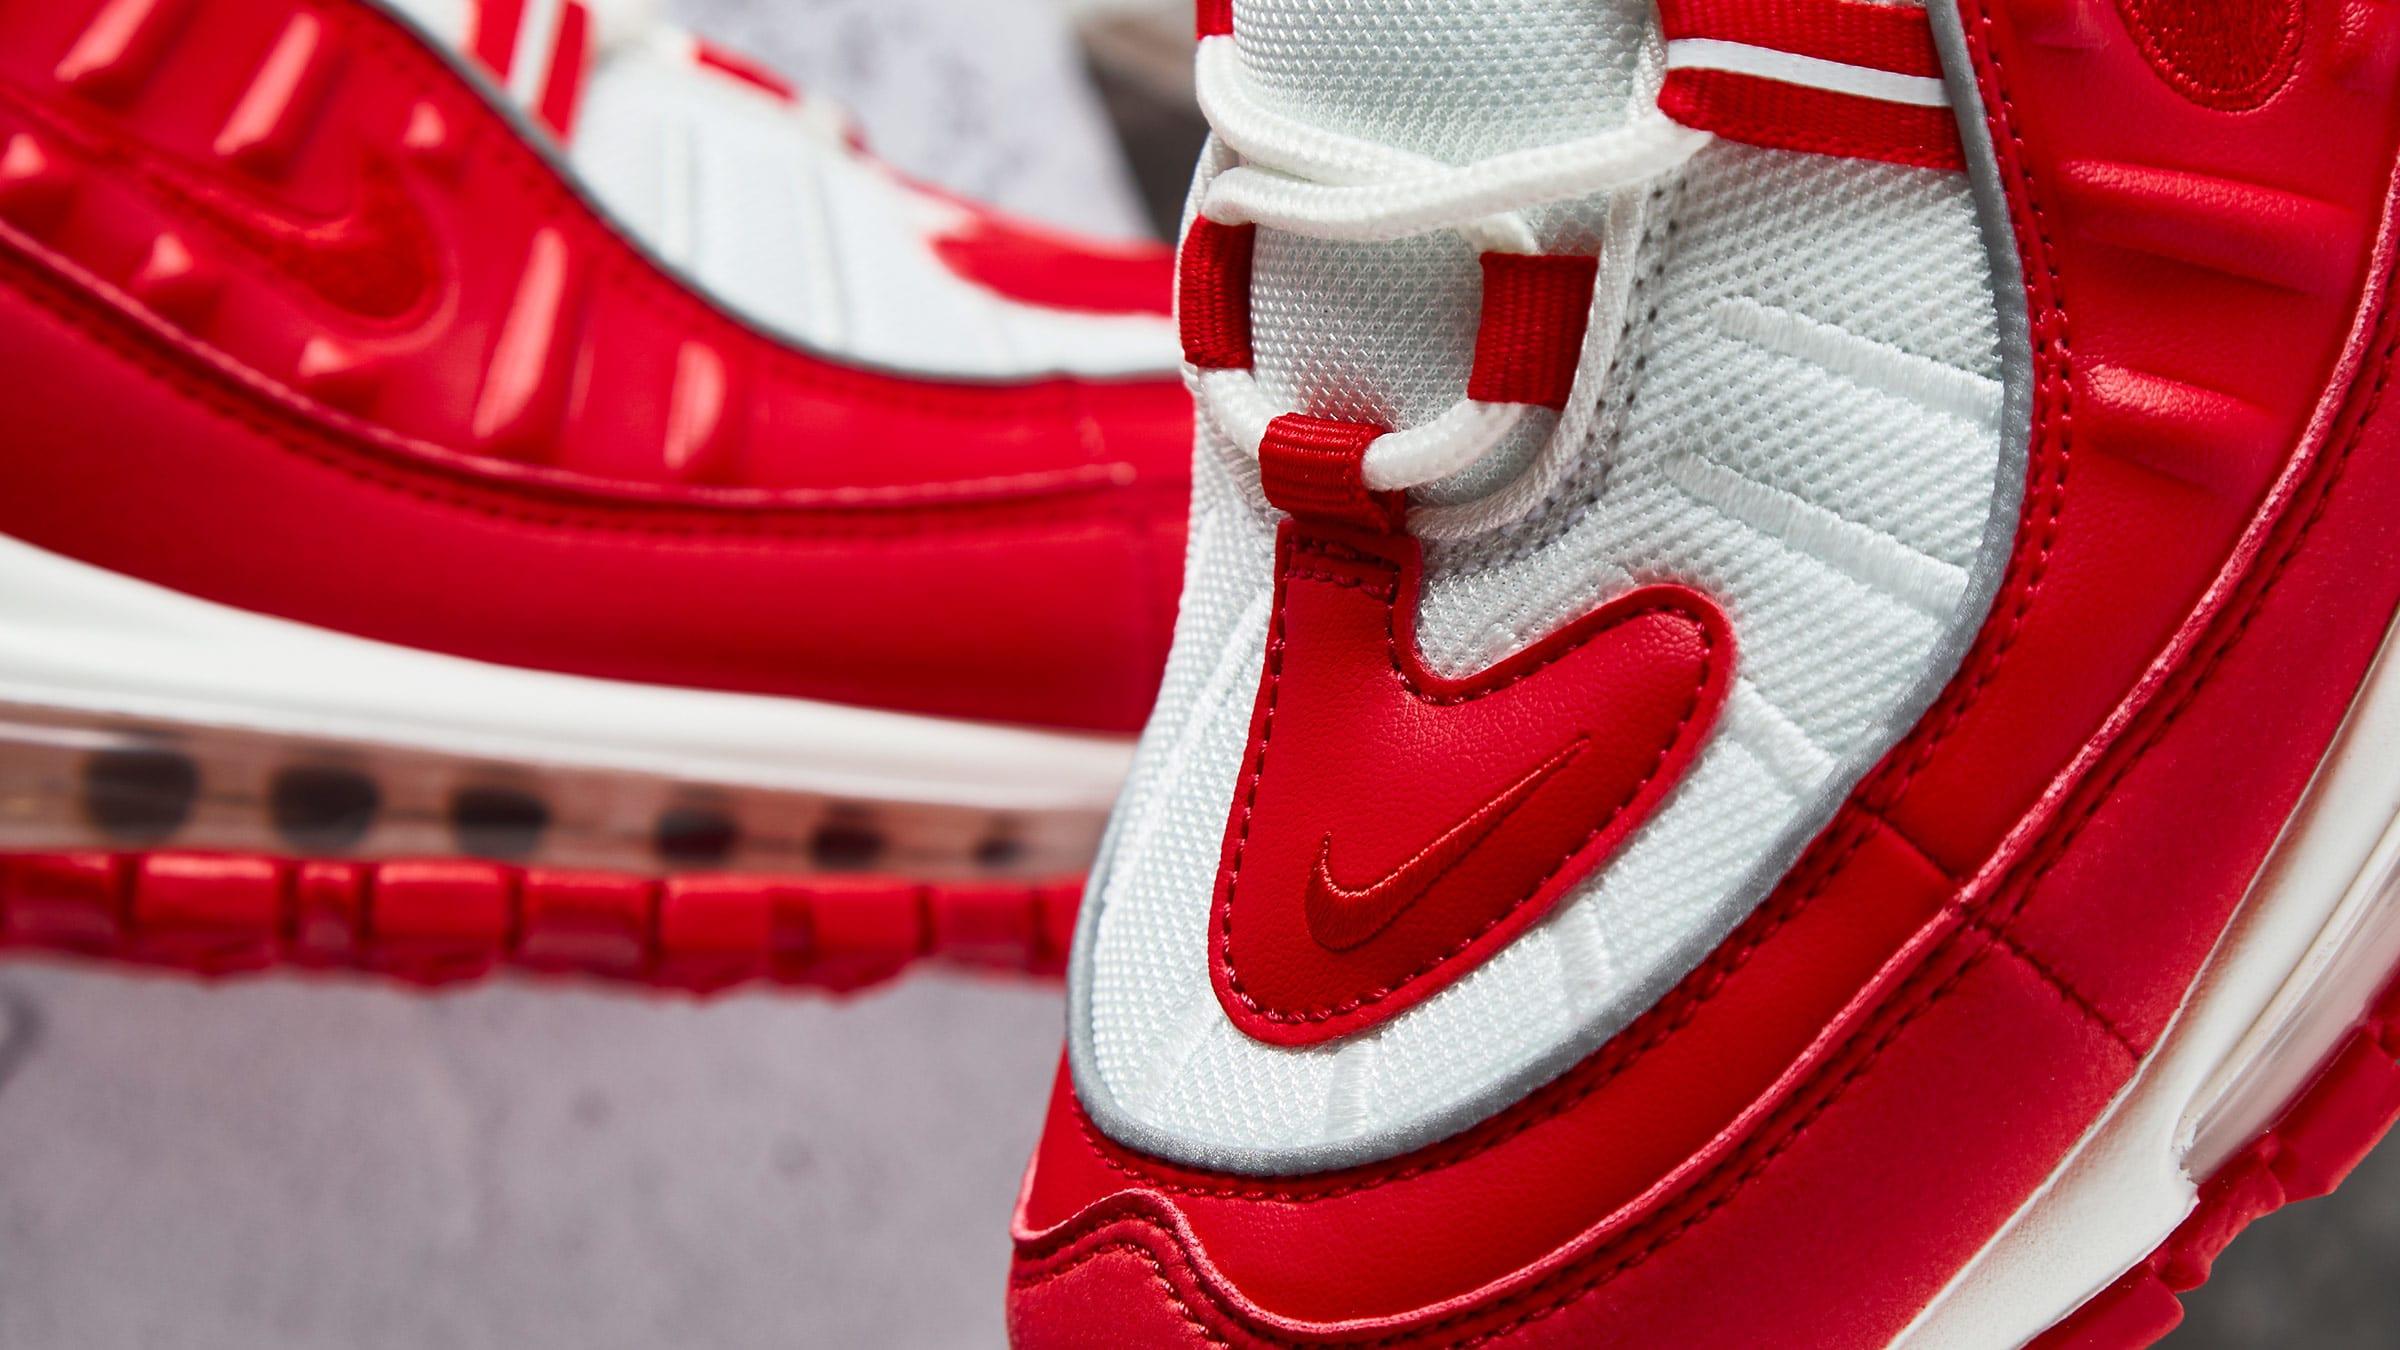 University Red